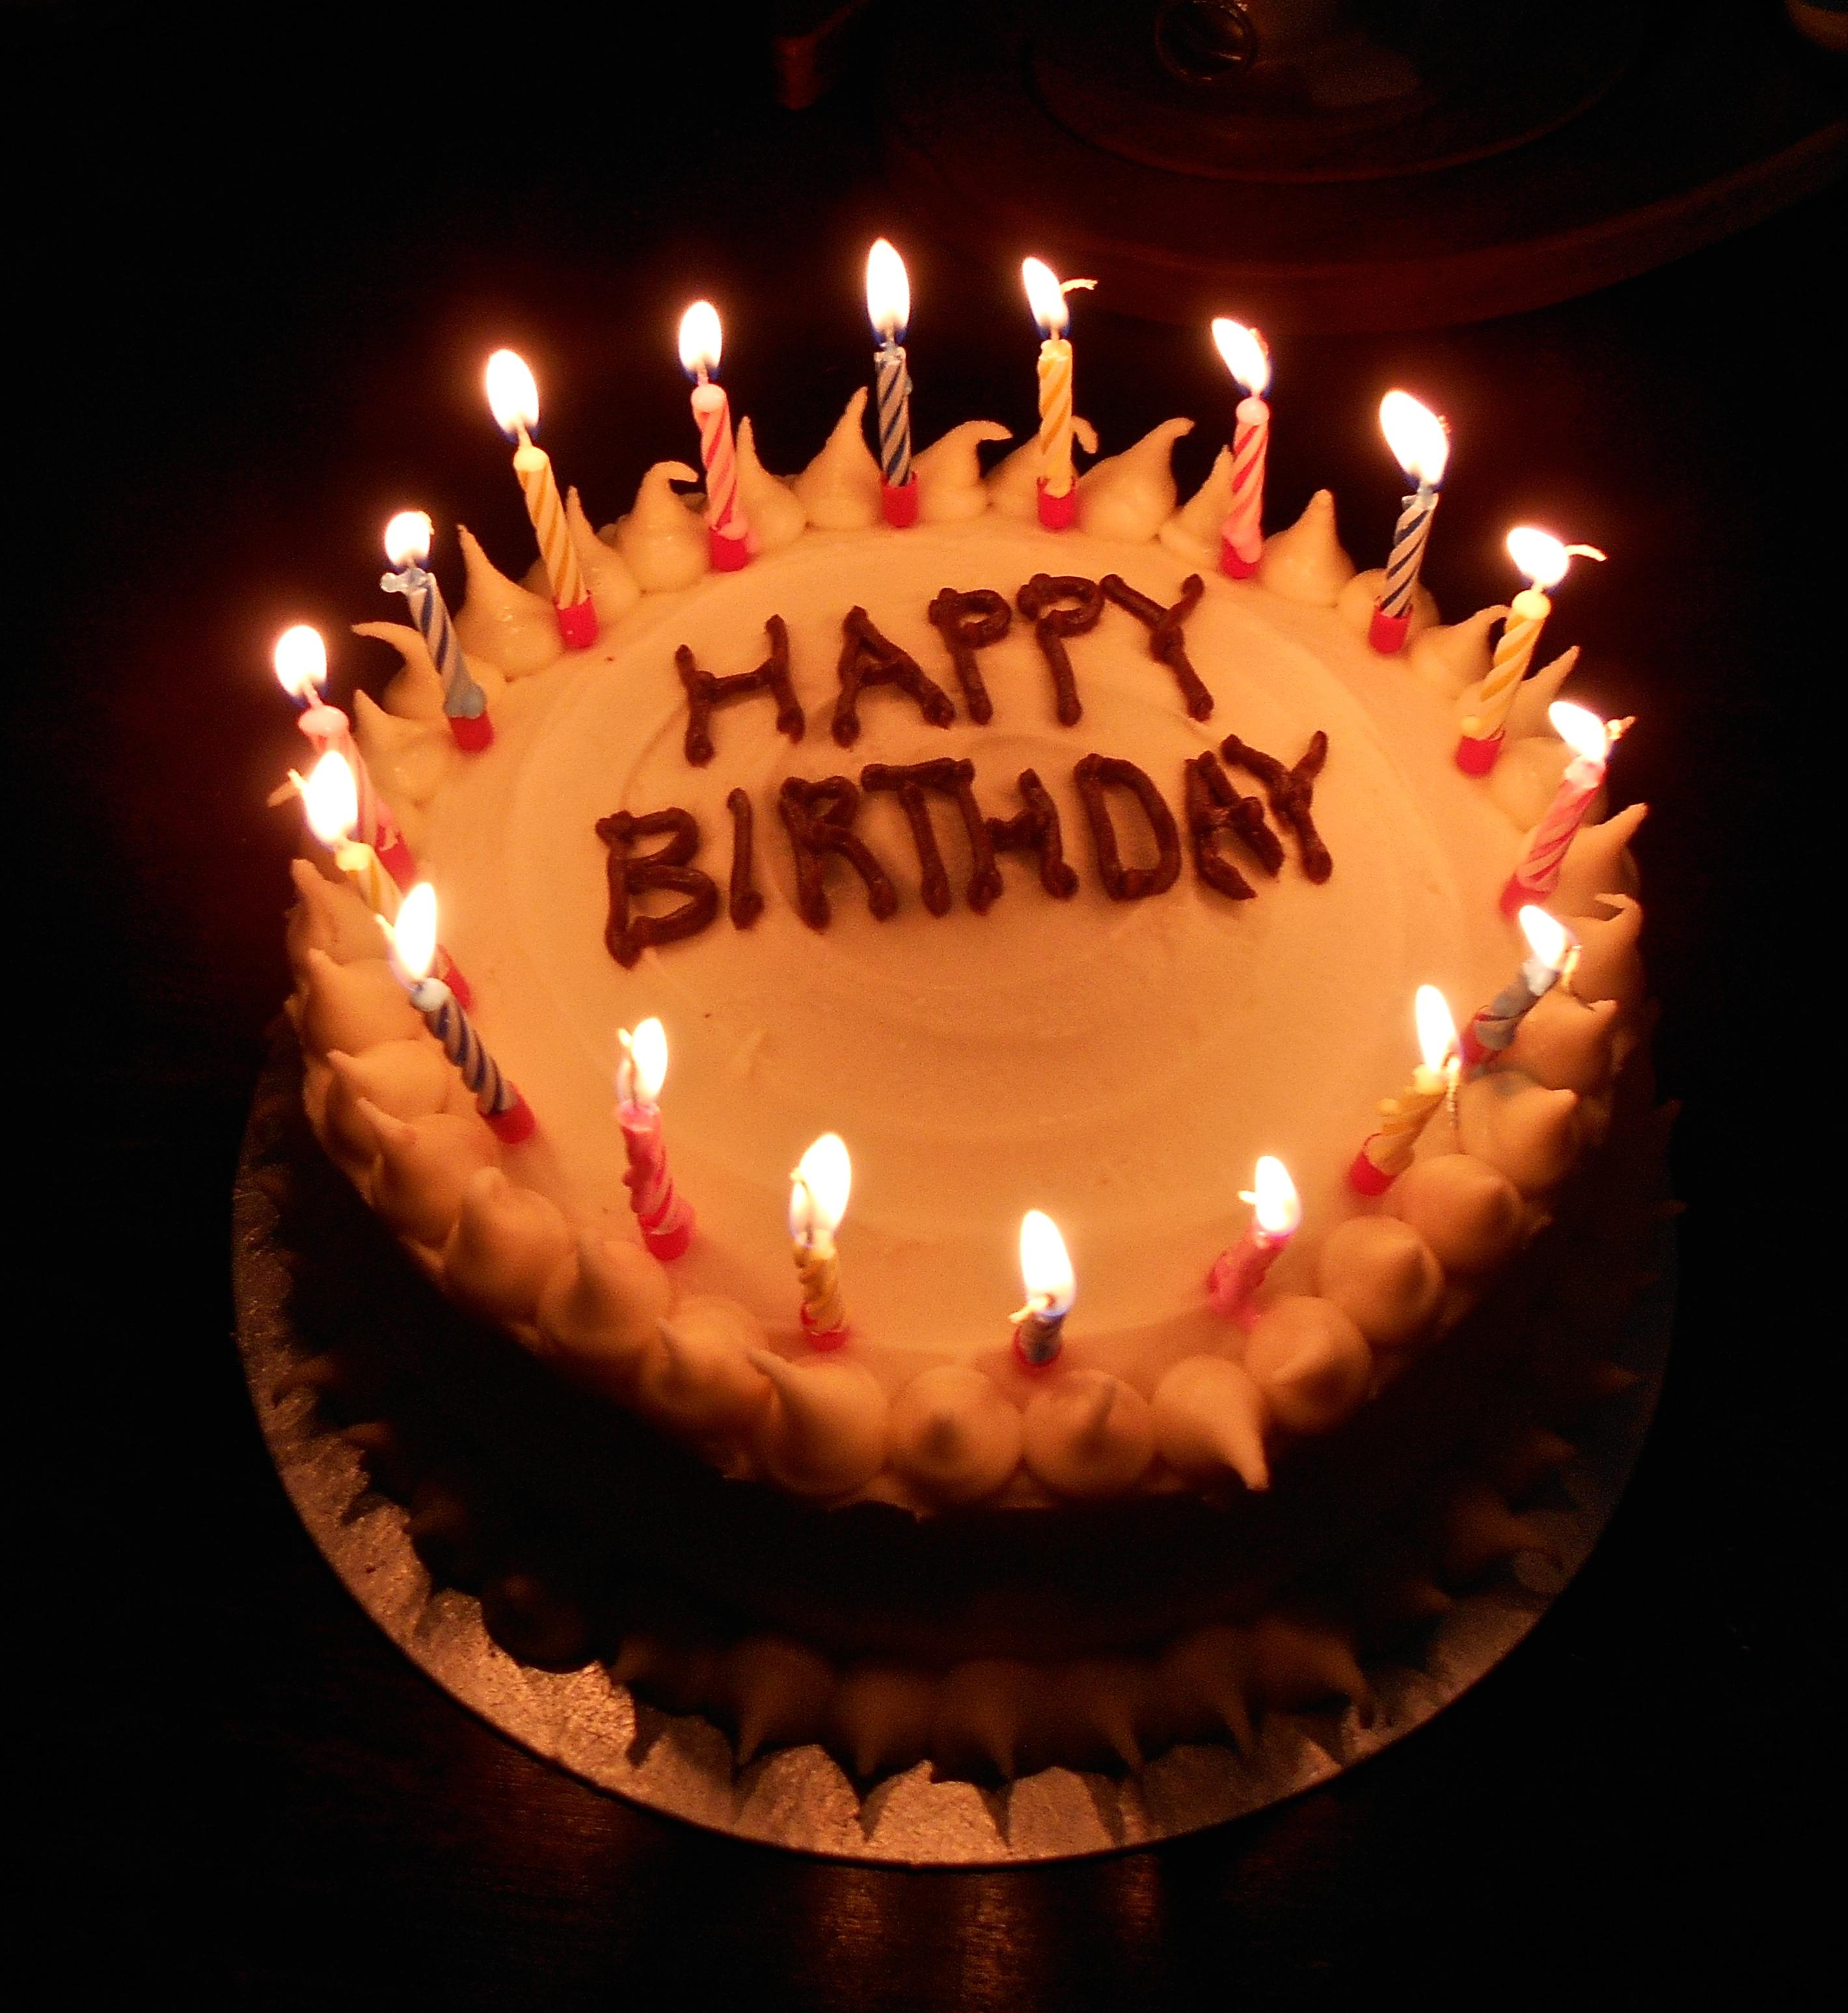 Vegan Birthday Cake (and Other Stories)